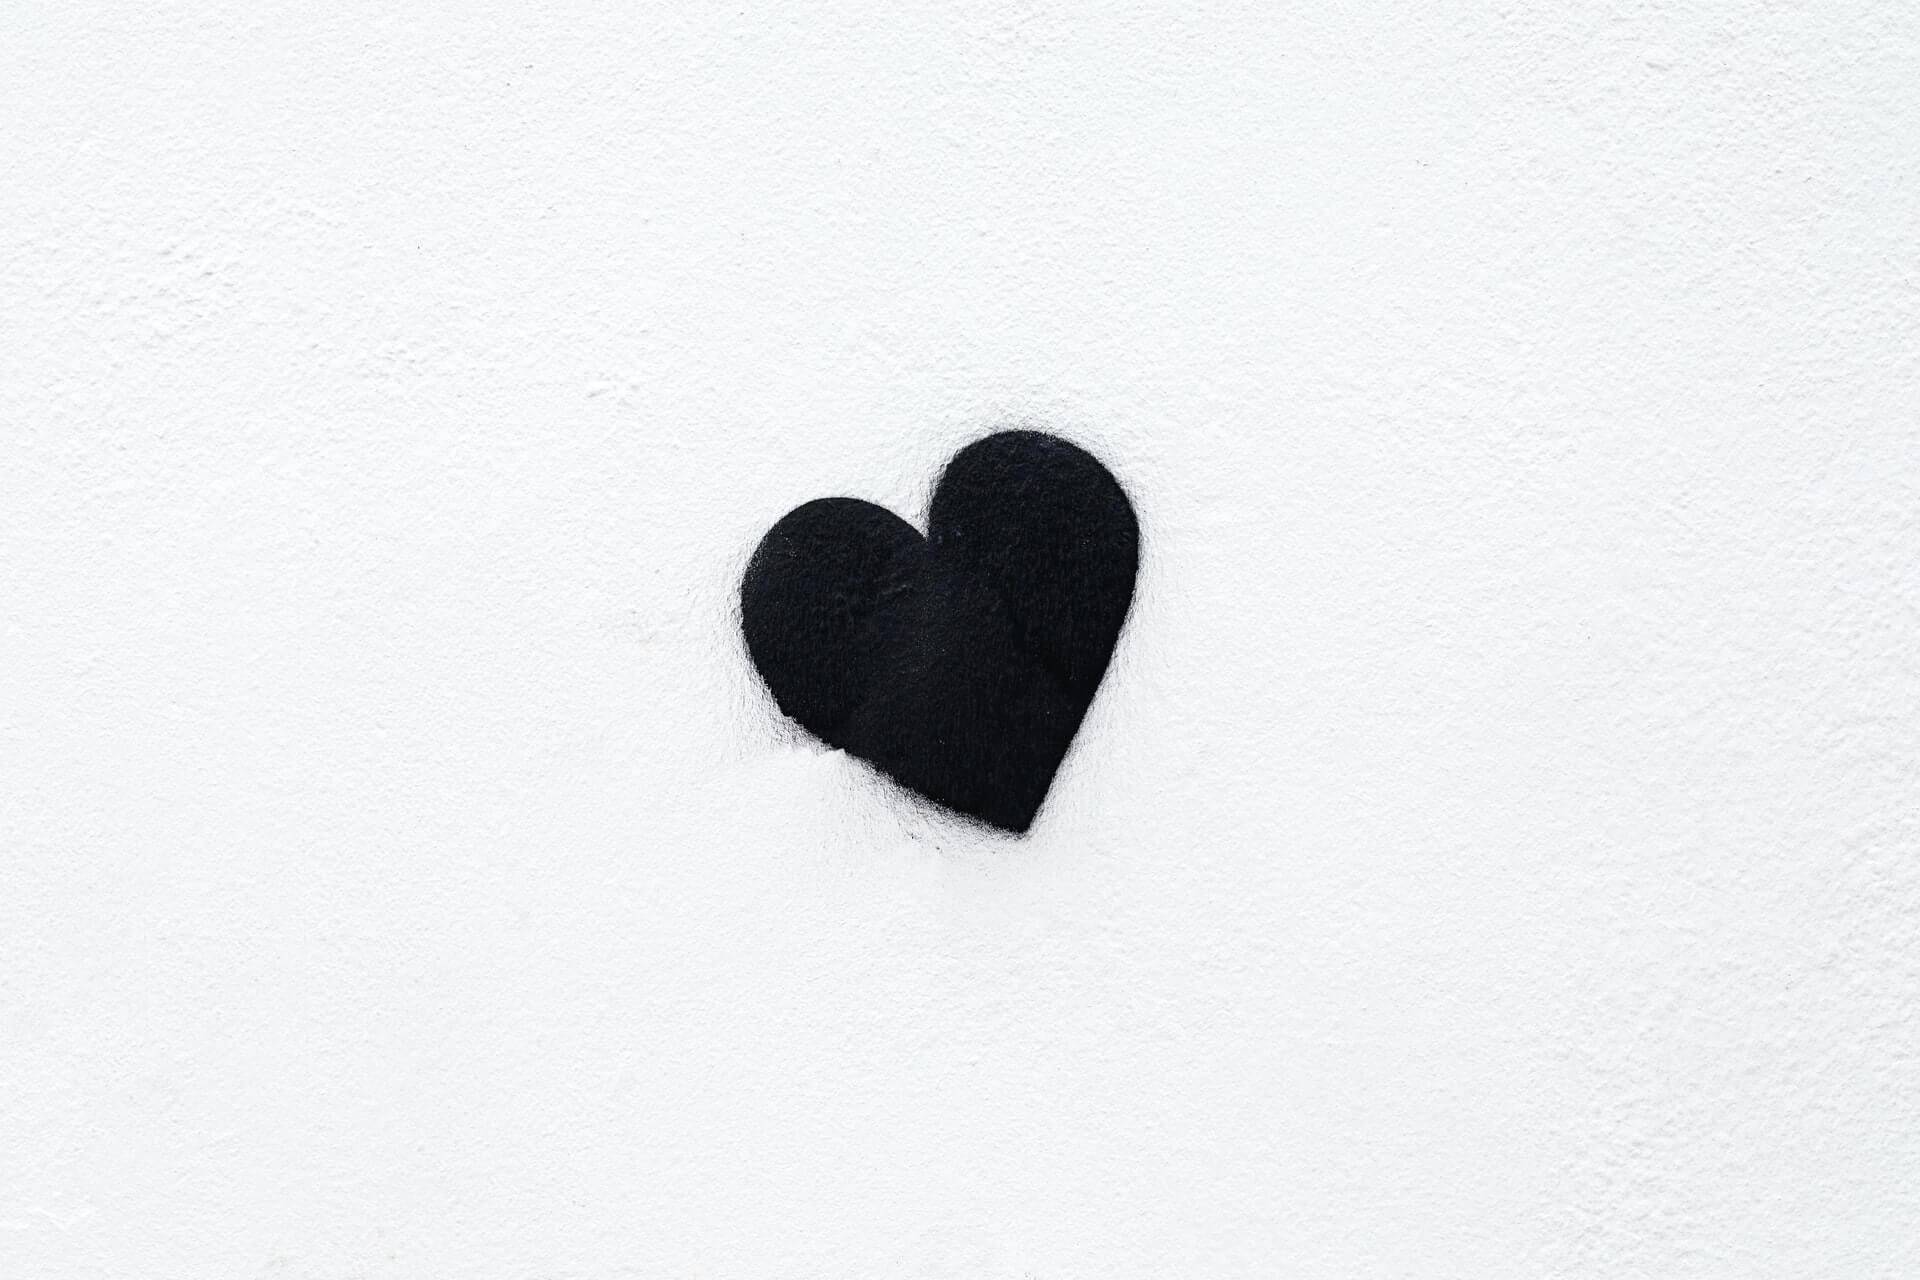 Monotone of logos, heart